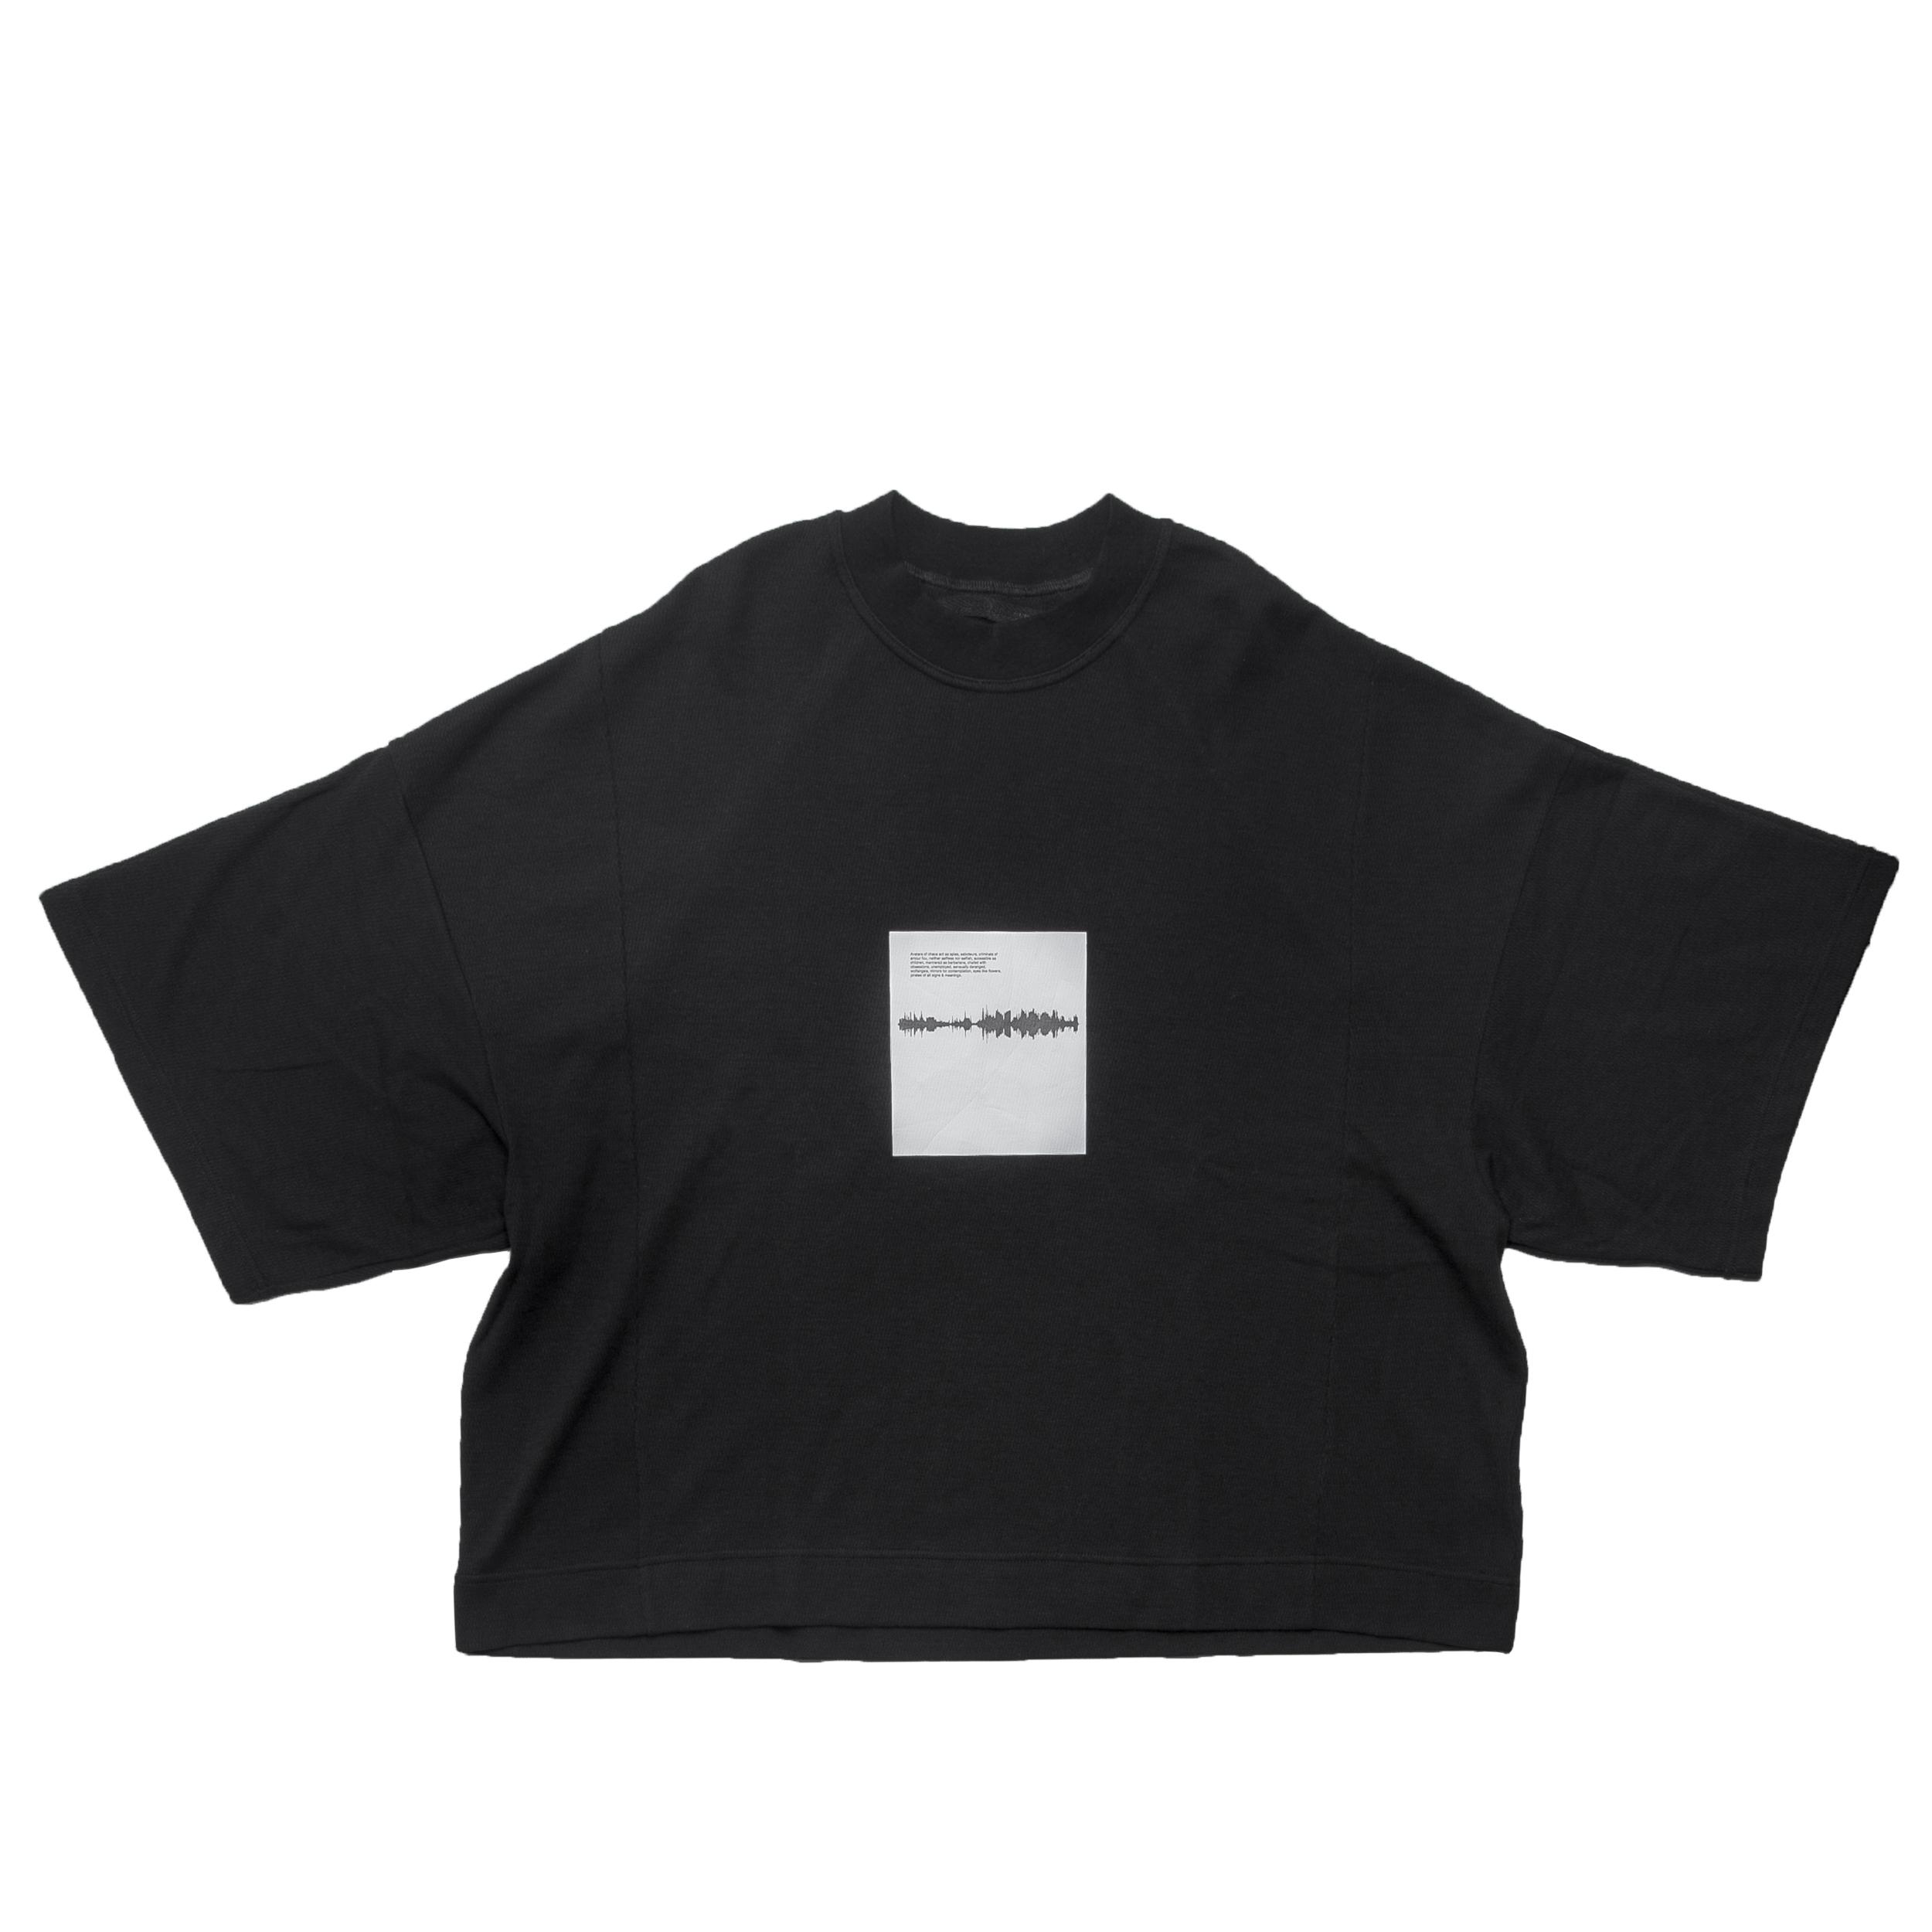 677CPM14-BLACK / Shaped Noise ボックス Tシャツ